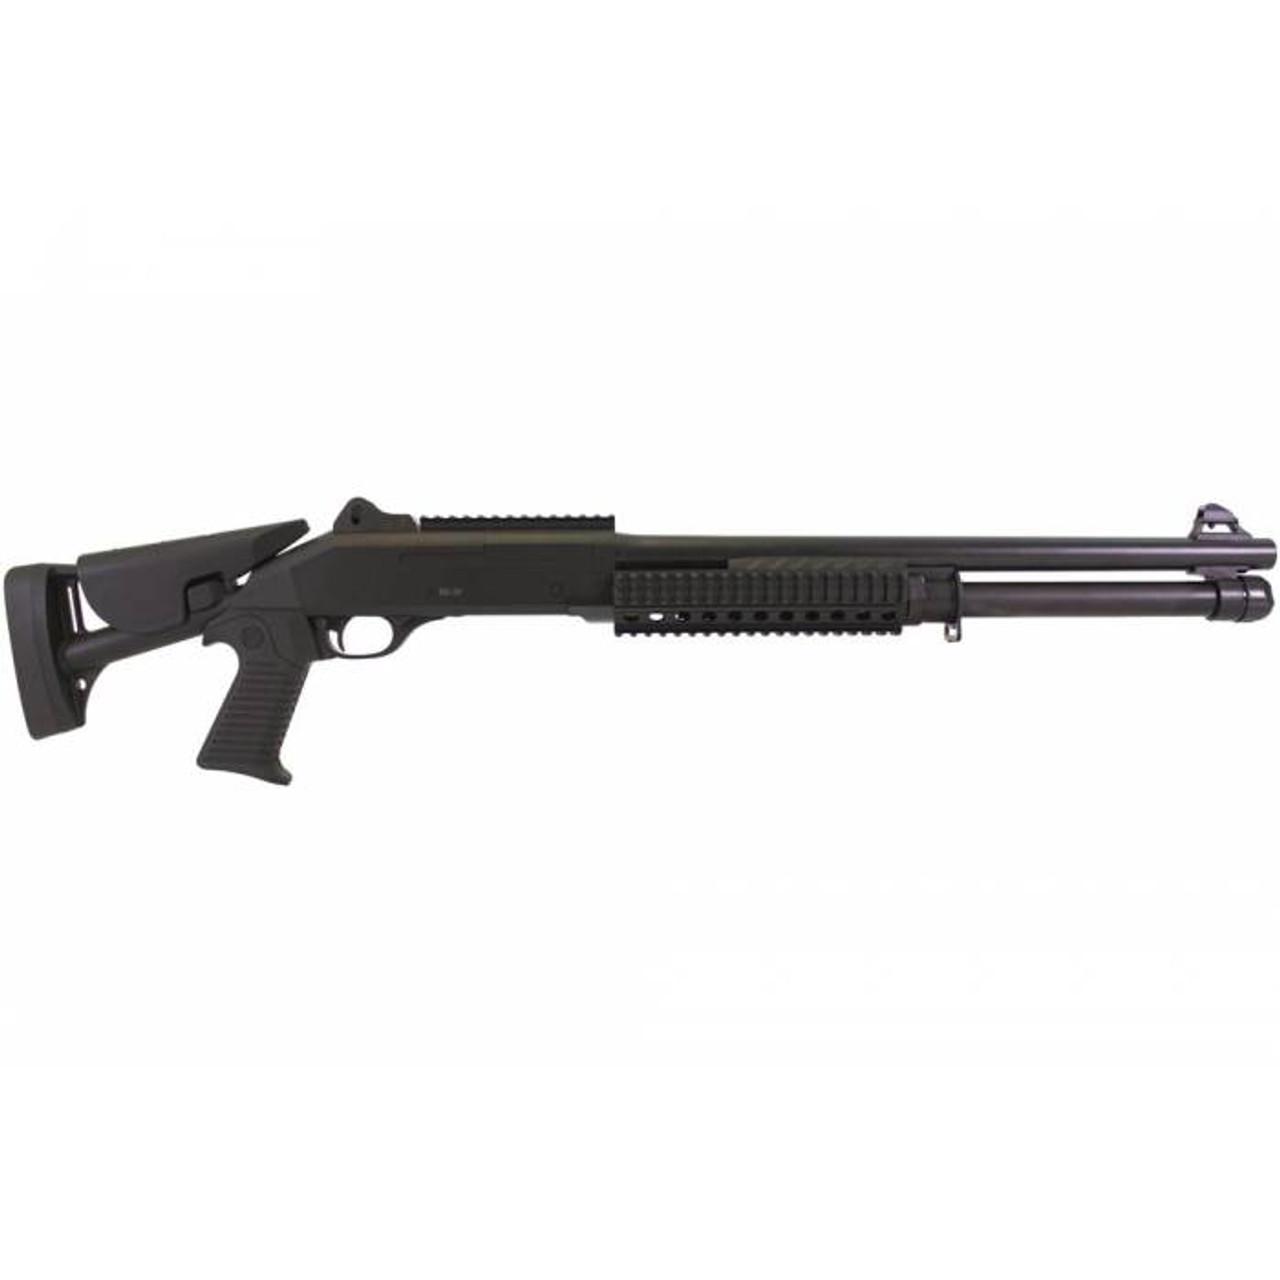 Nuprol Sierra Storm Bravo Tactical Shotgun - Black